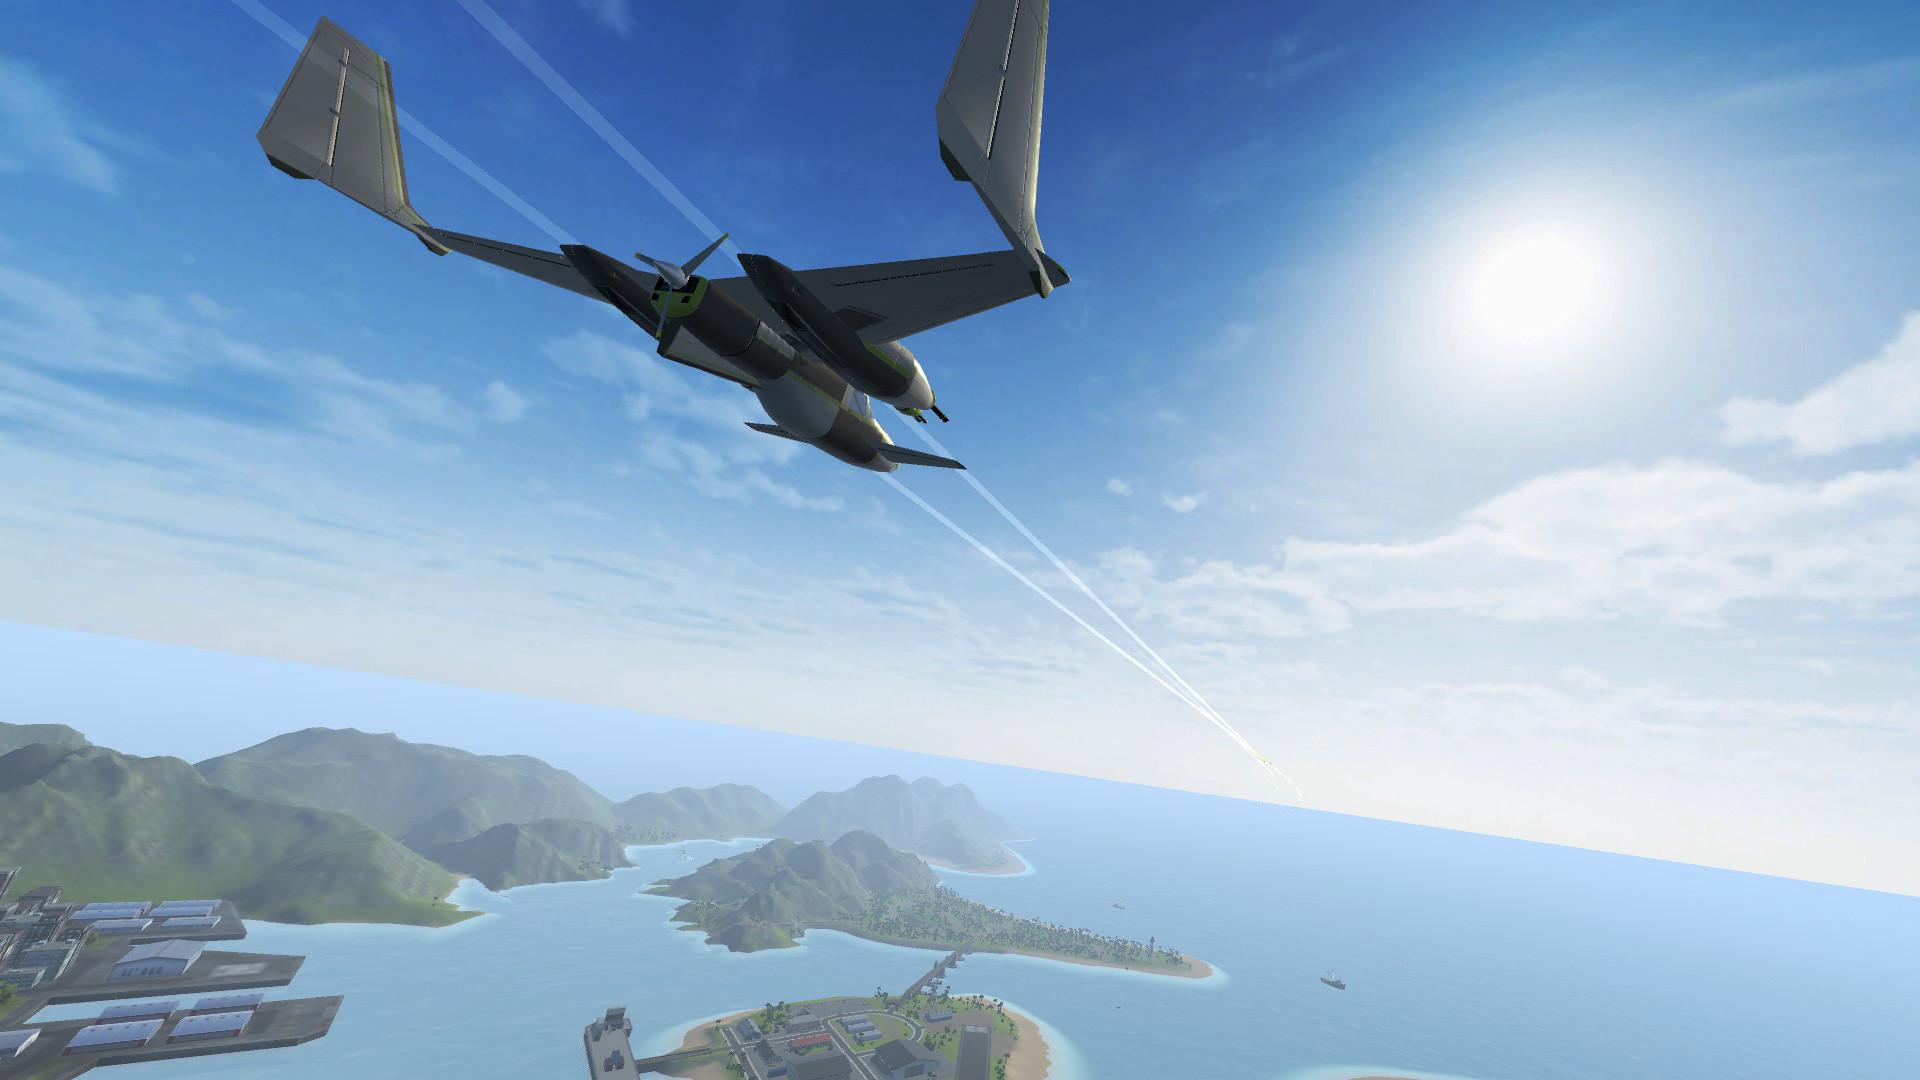 Balsa Model Flight Simulator orbx add-ons support